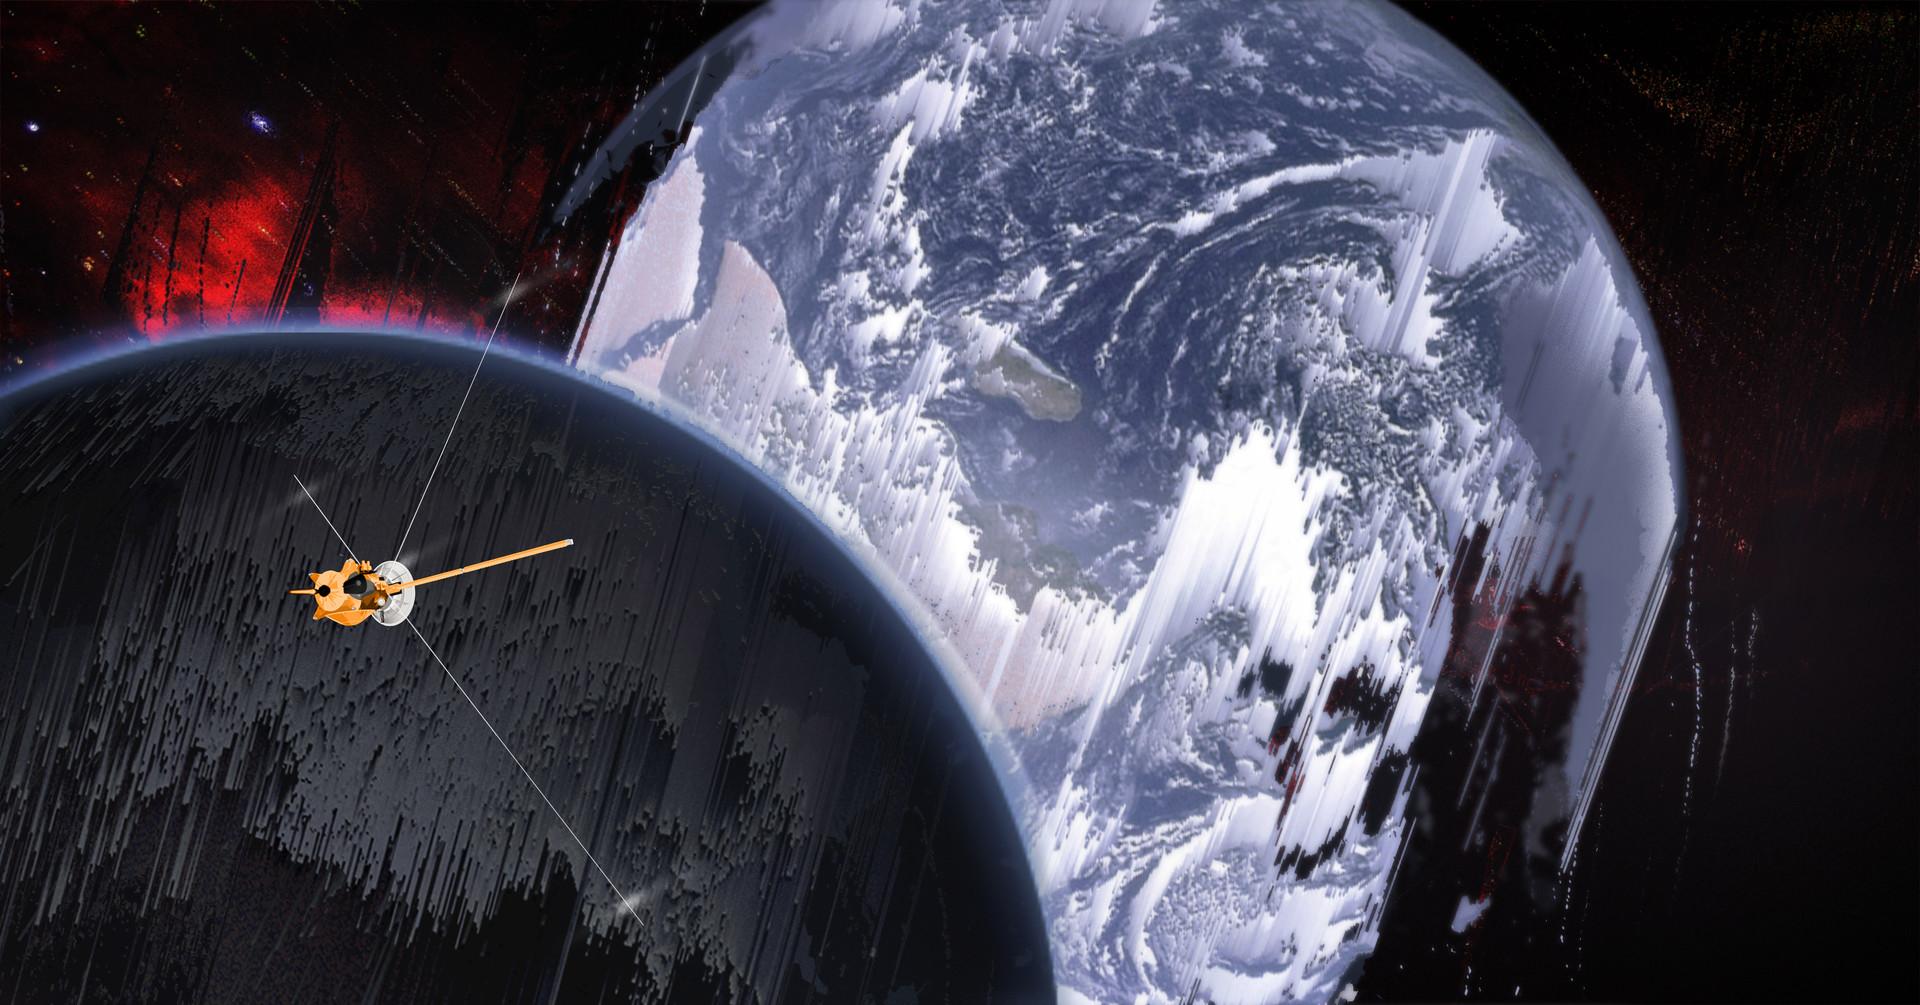 Korina hunjak earth moon